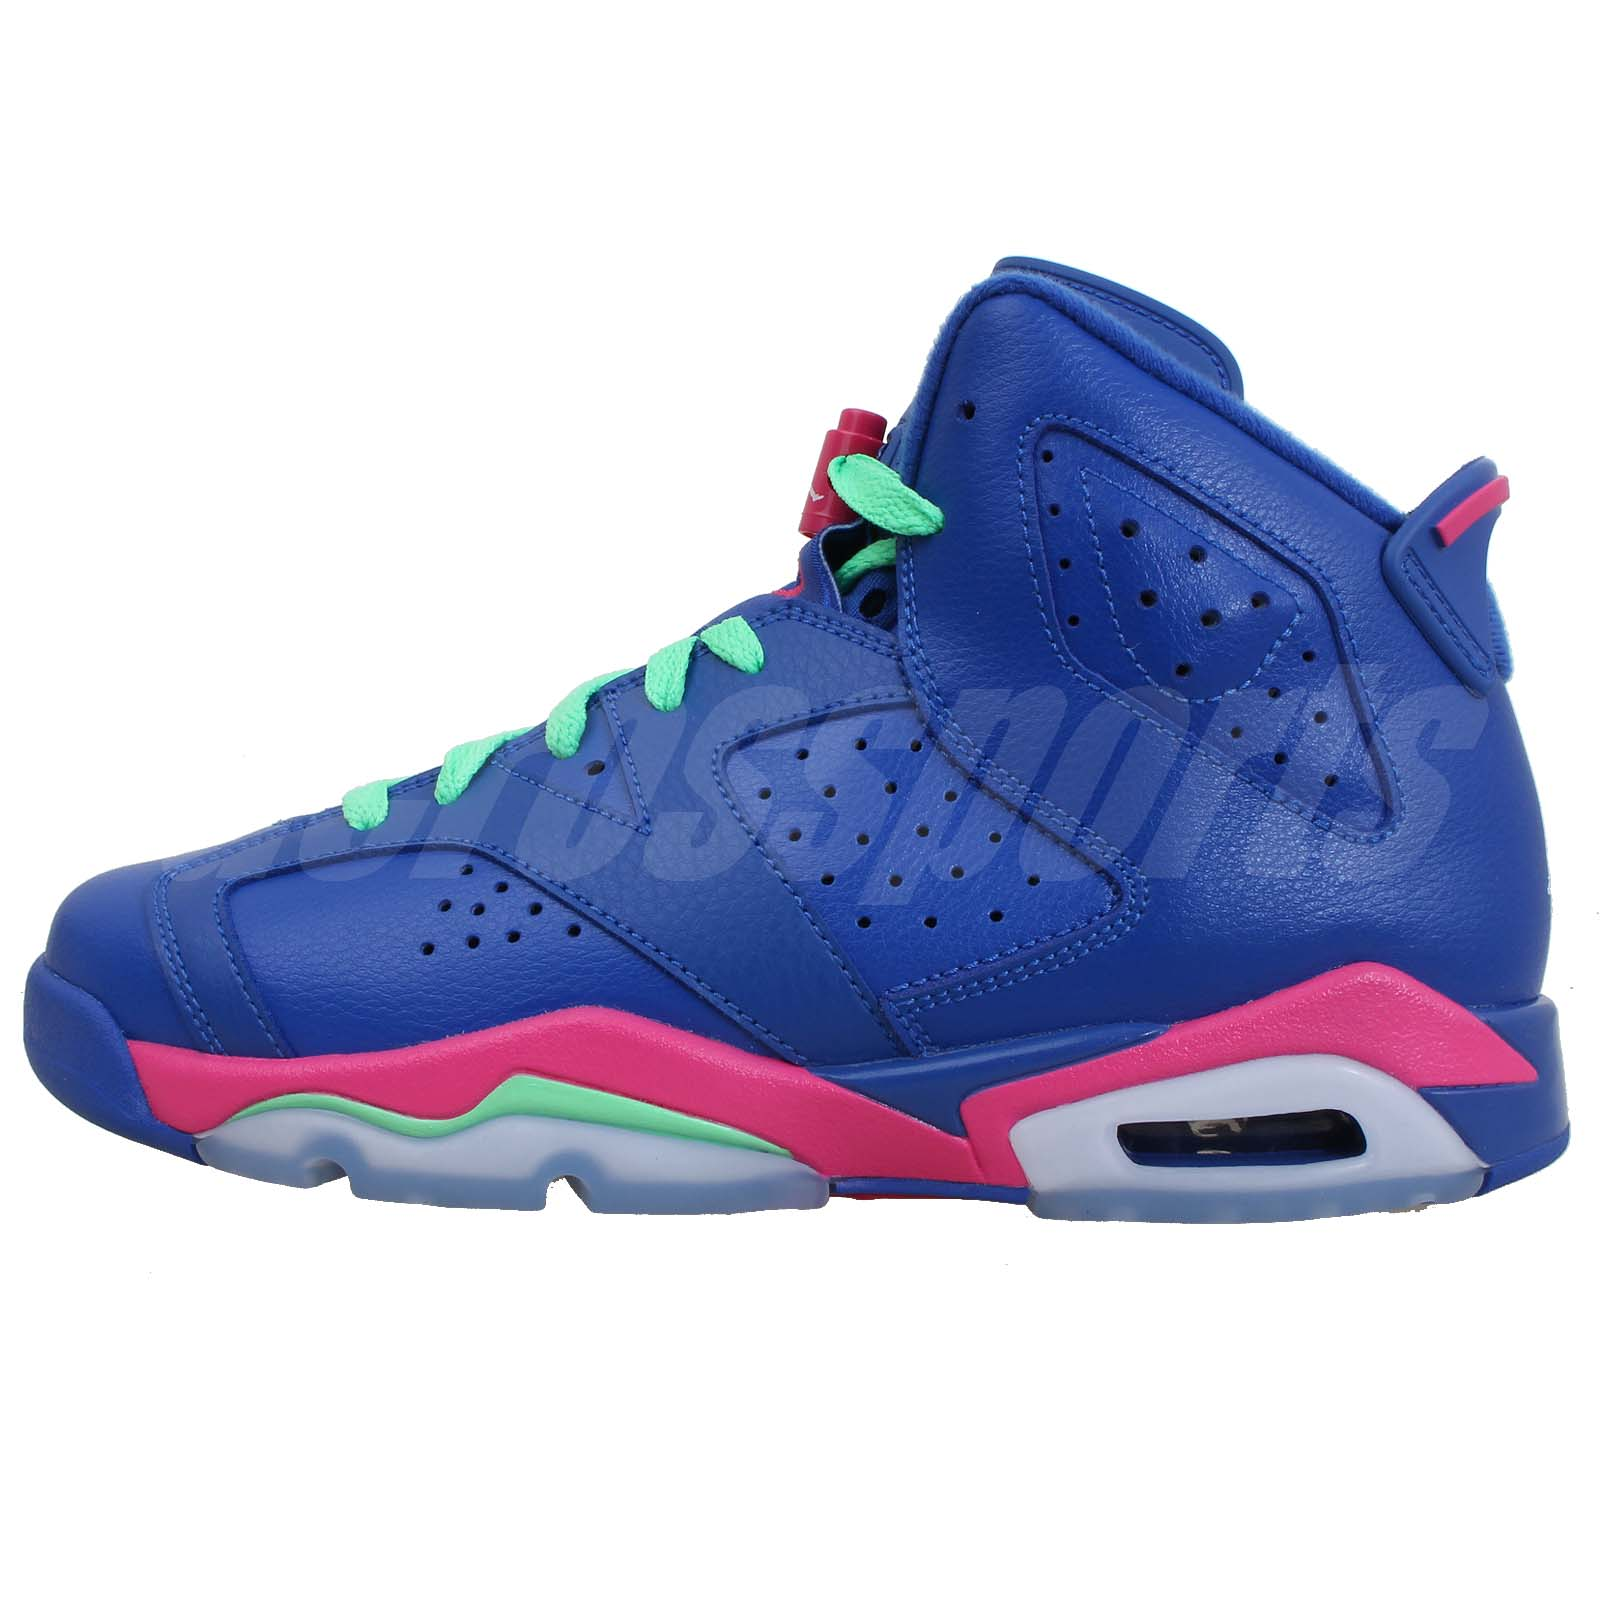 Nike Air Jordan 6 Retro GG GS Girls Youth 2014 Blue Pink ...